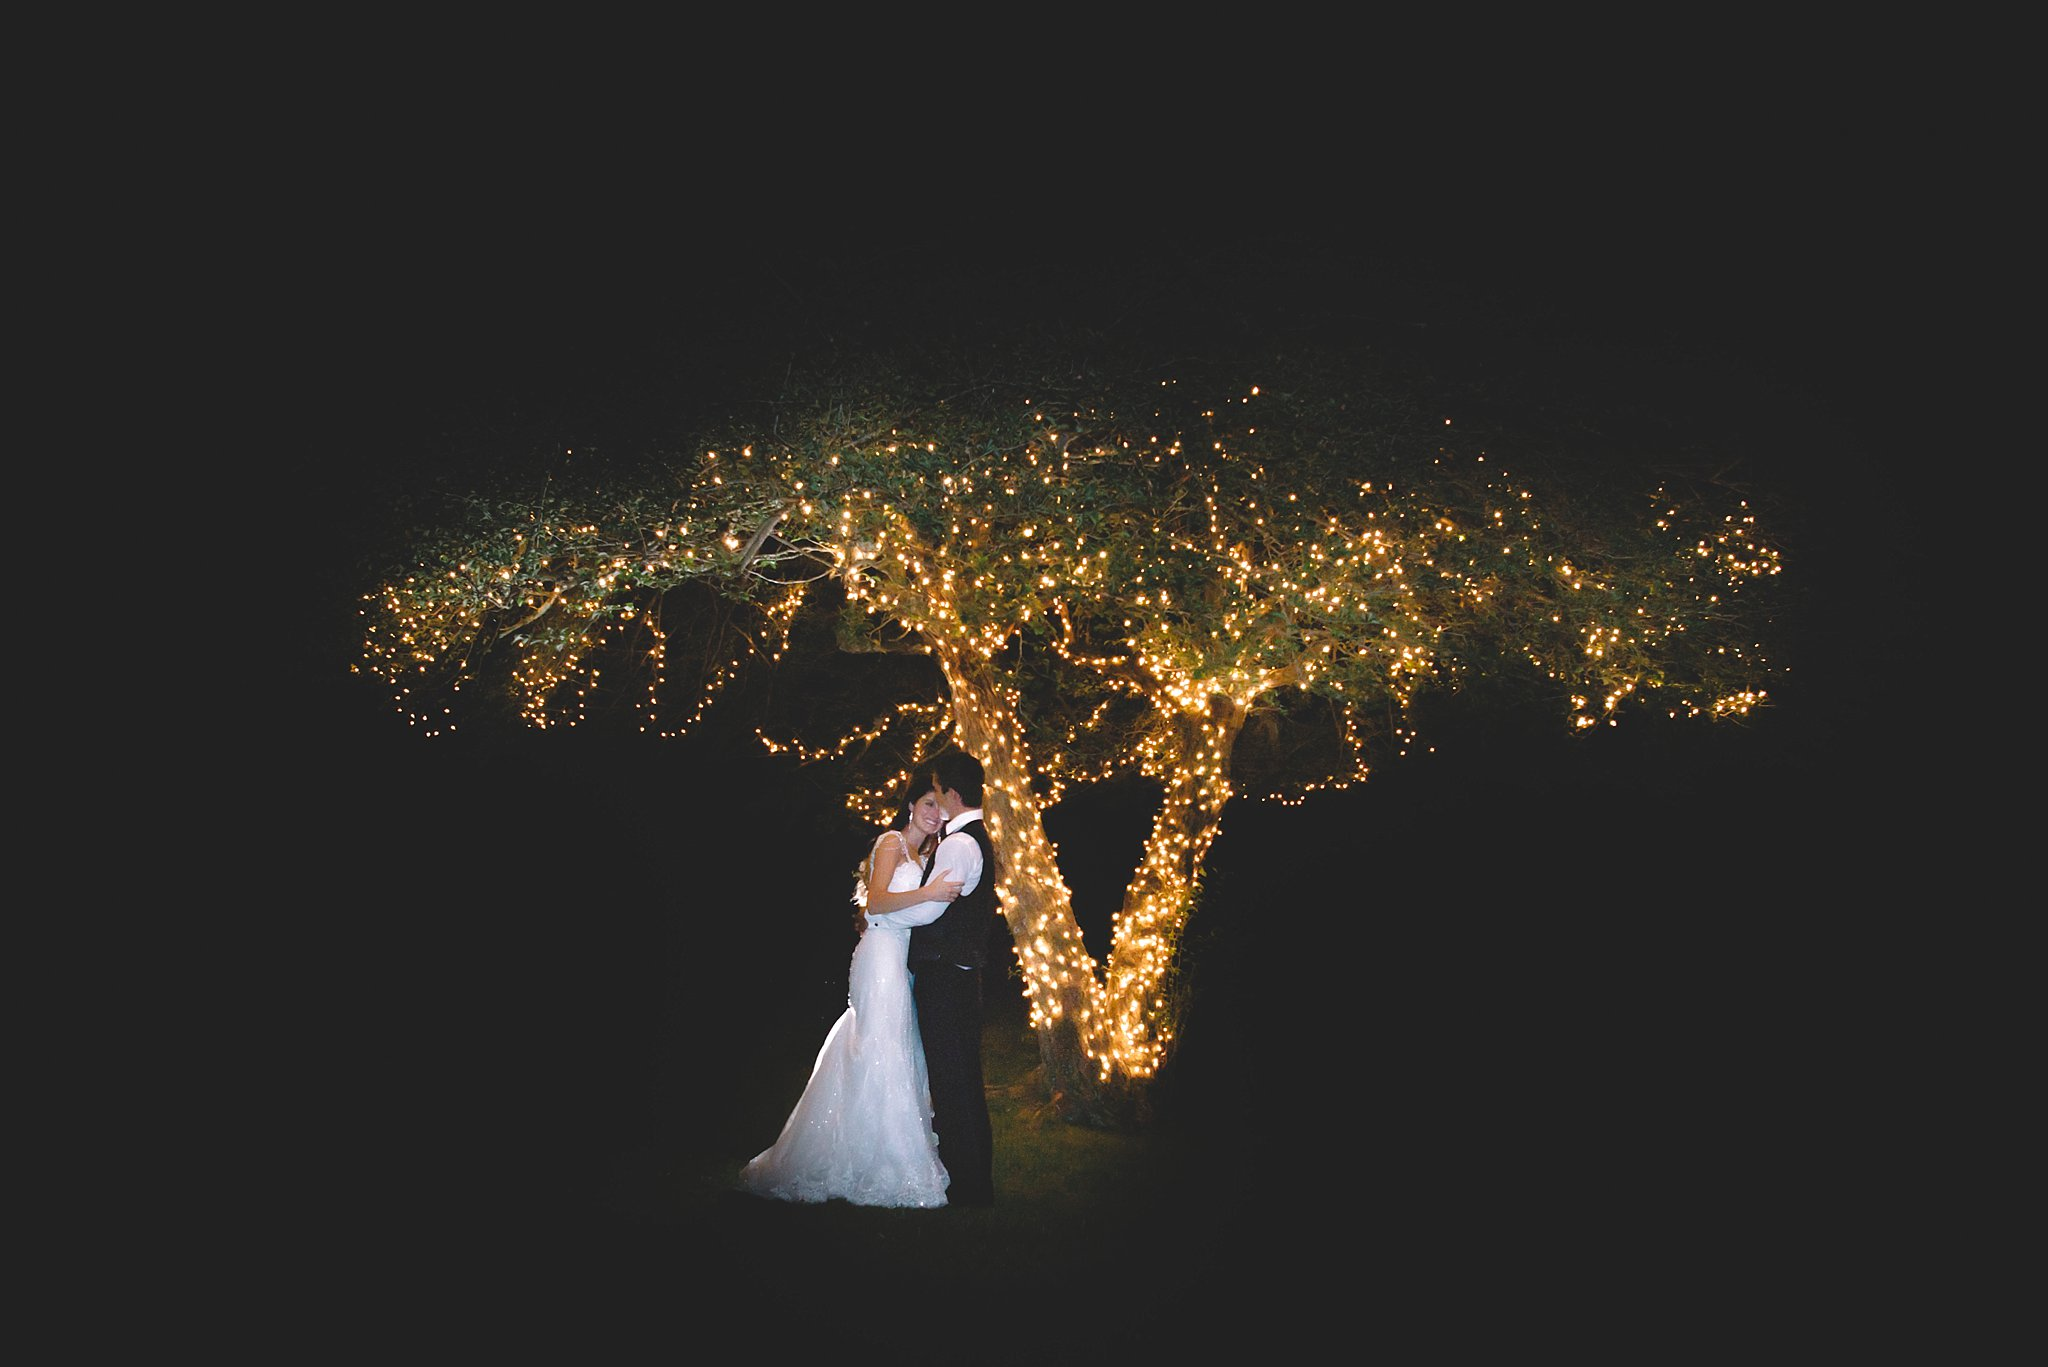 Wedding Photography- night portrait